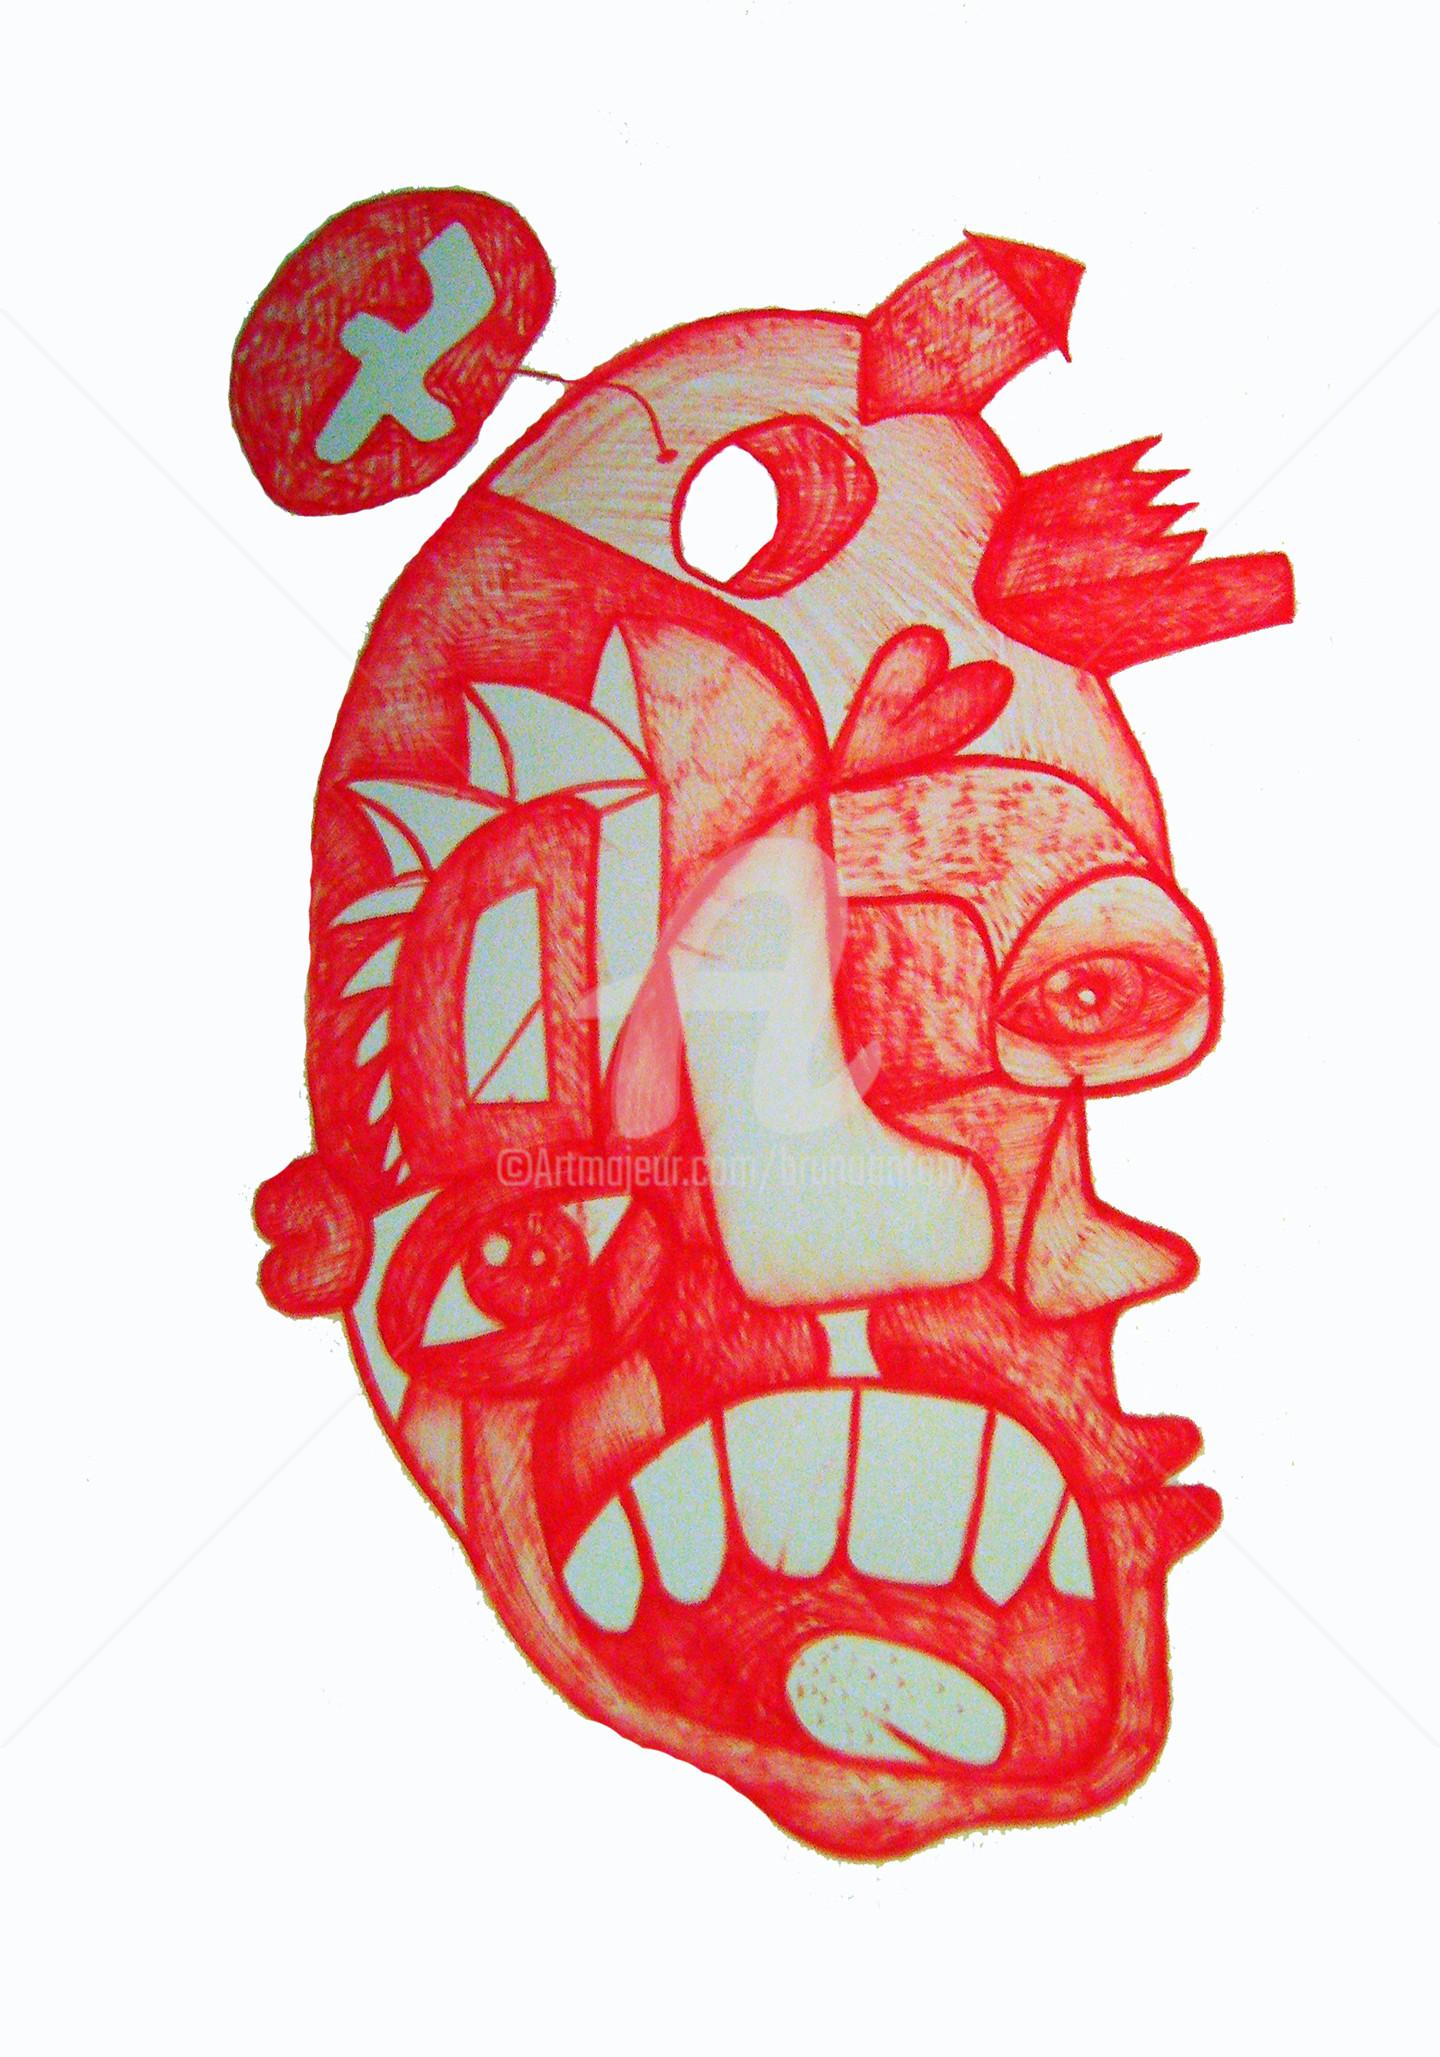 Bruno Antony-Thouret (bruno antony) - Homme multiple rouge